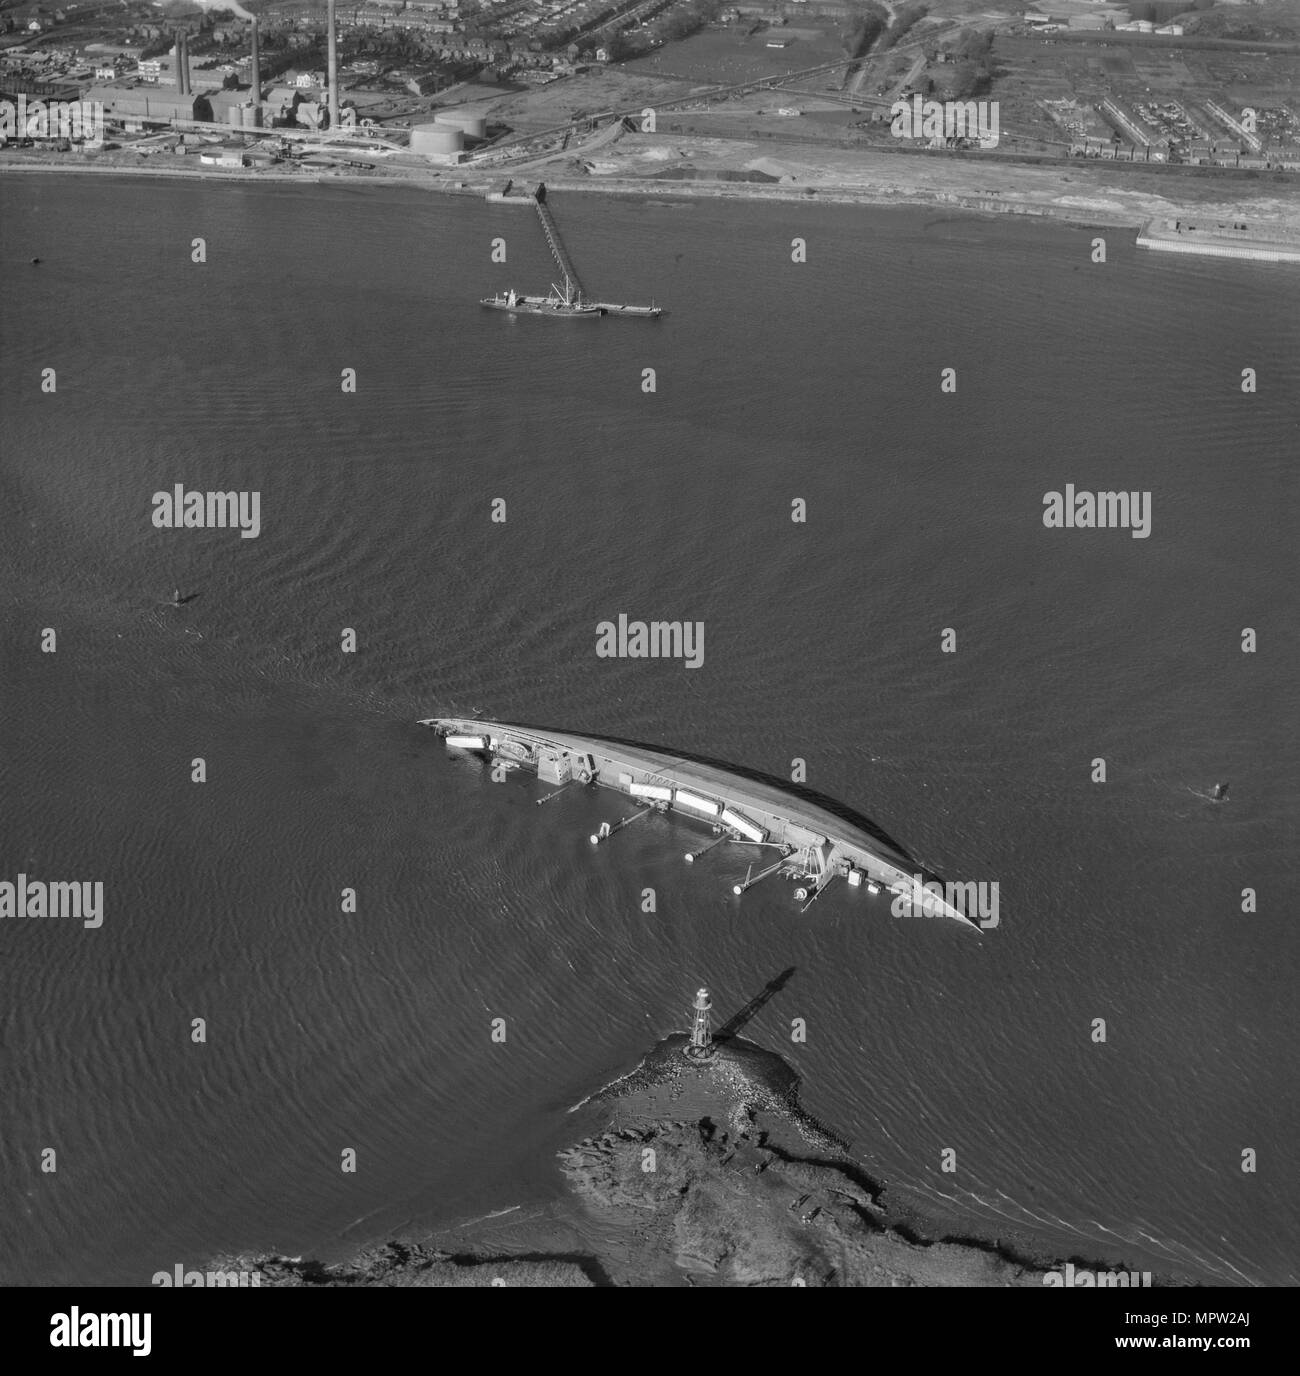 Shipwreck at Fiddler's Reach on the River Thames, London, November 1964. Artist: Freeman. - Stock Image